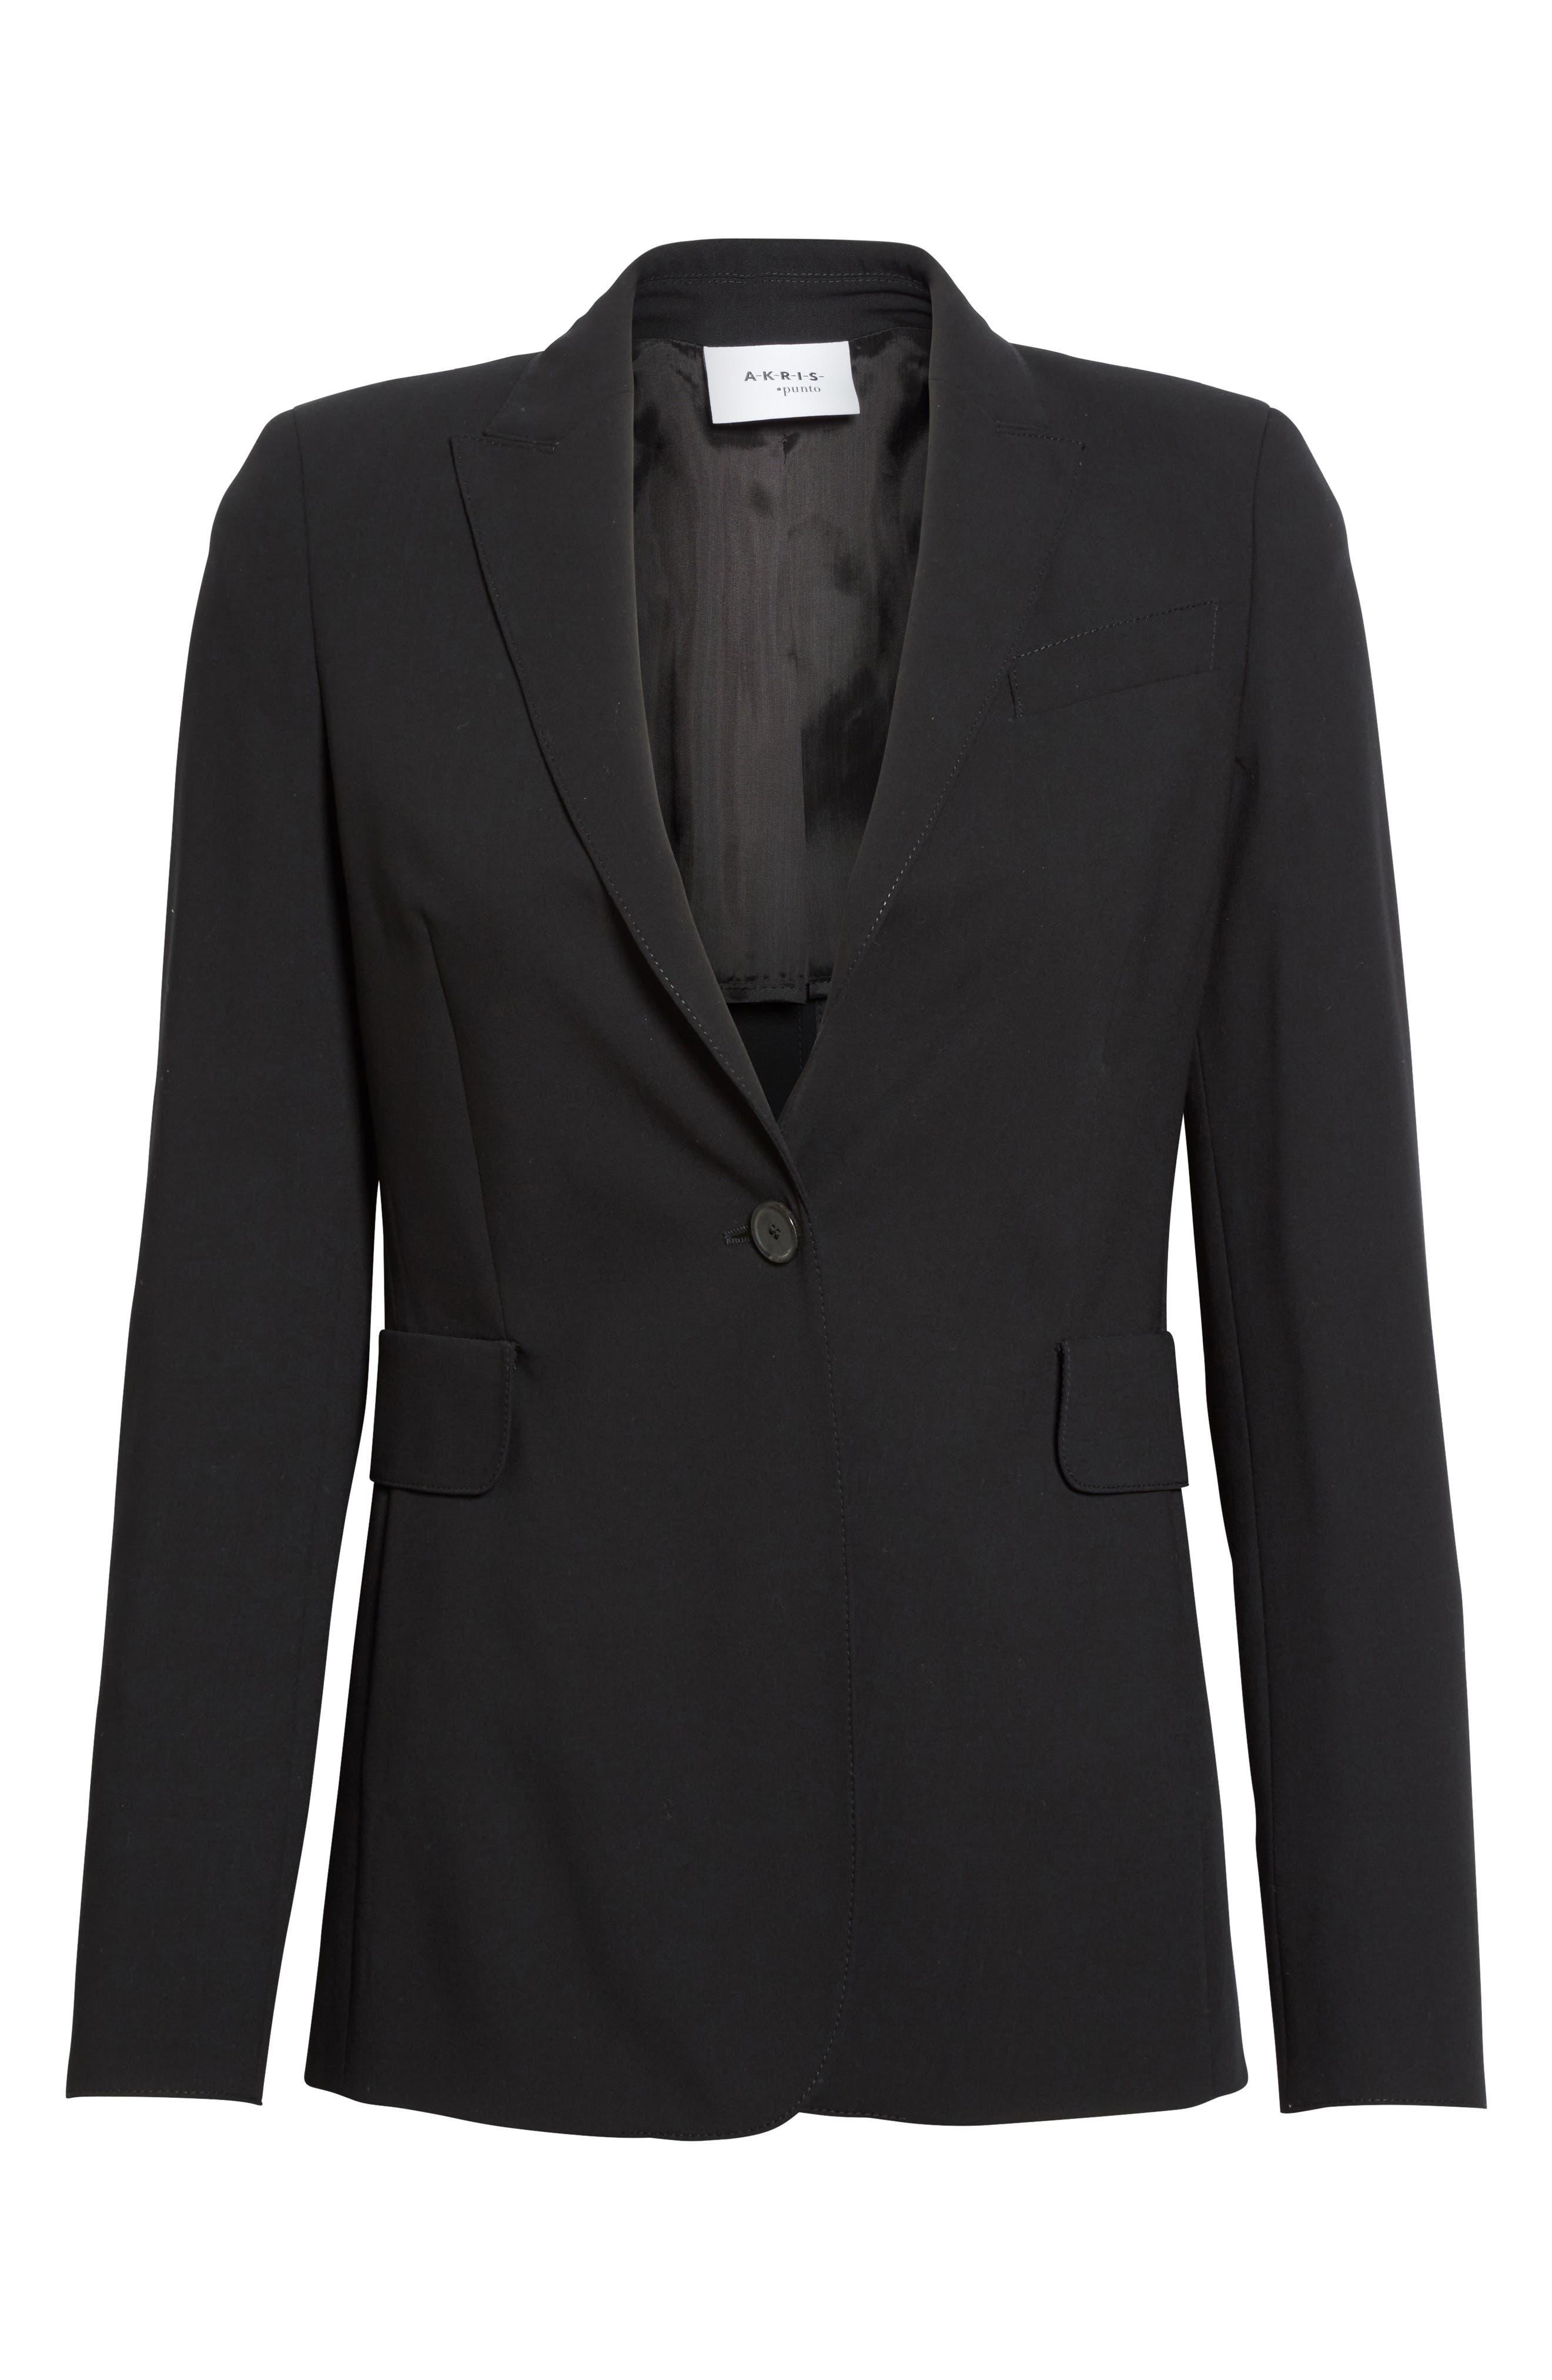 AKRIS PUNTO, Long One-Button Jacket, Alternate thumbnail 6, color, BLACK